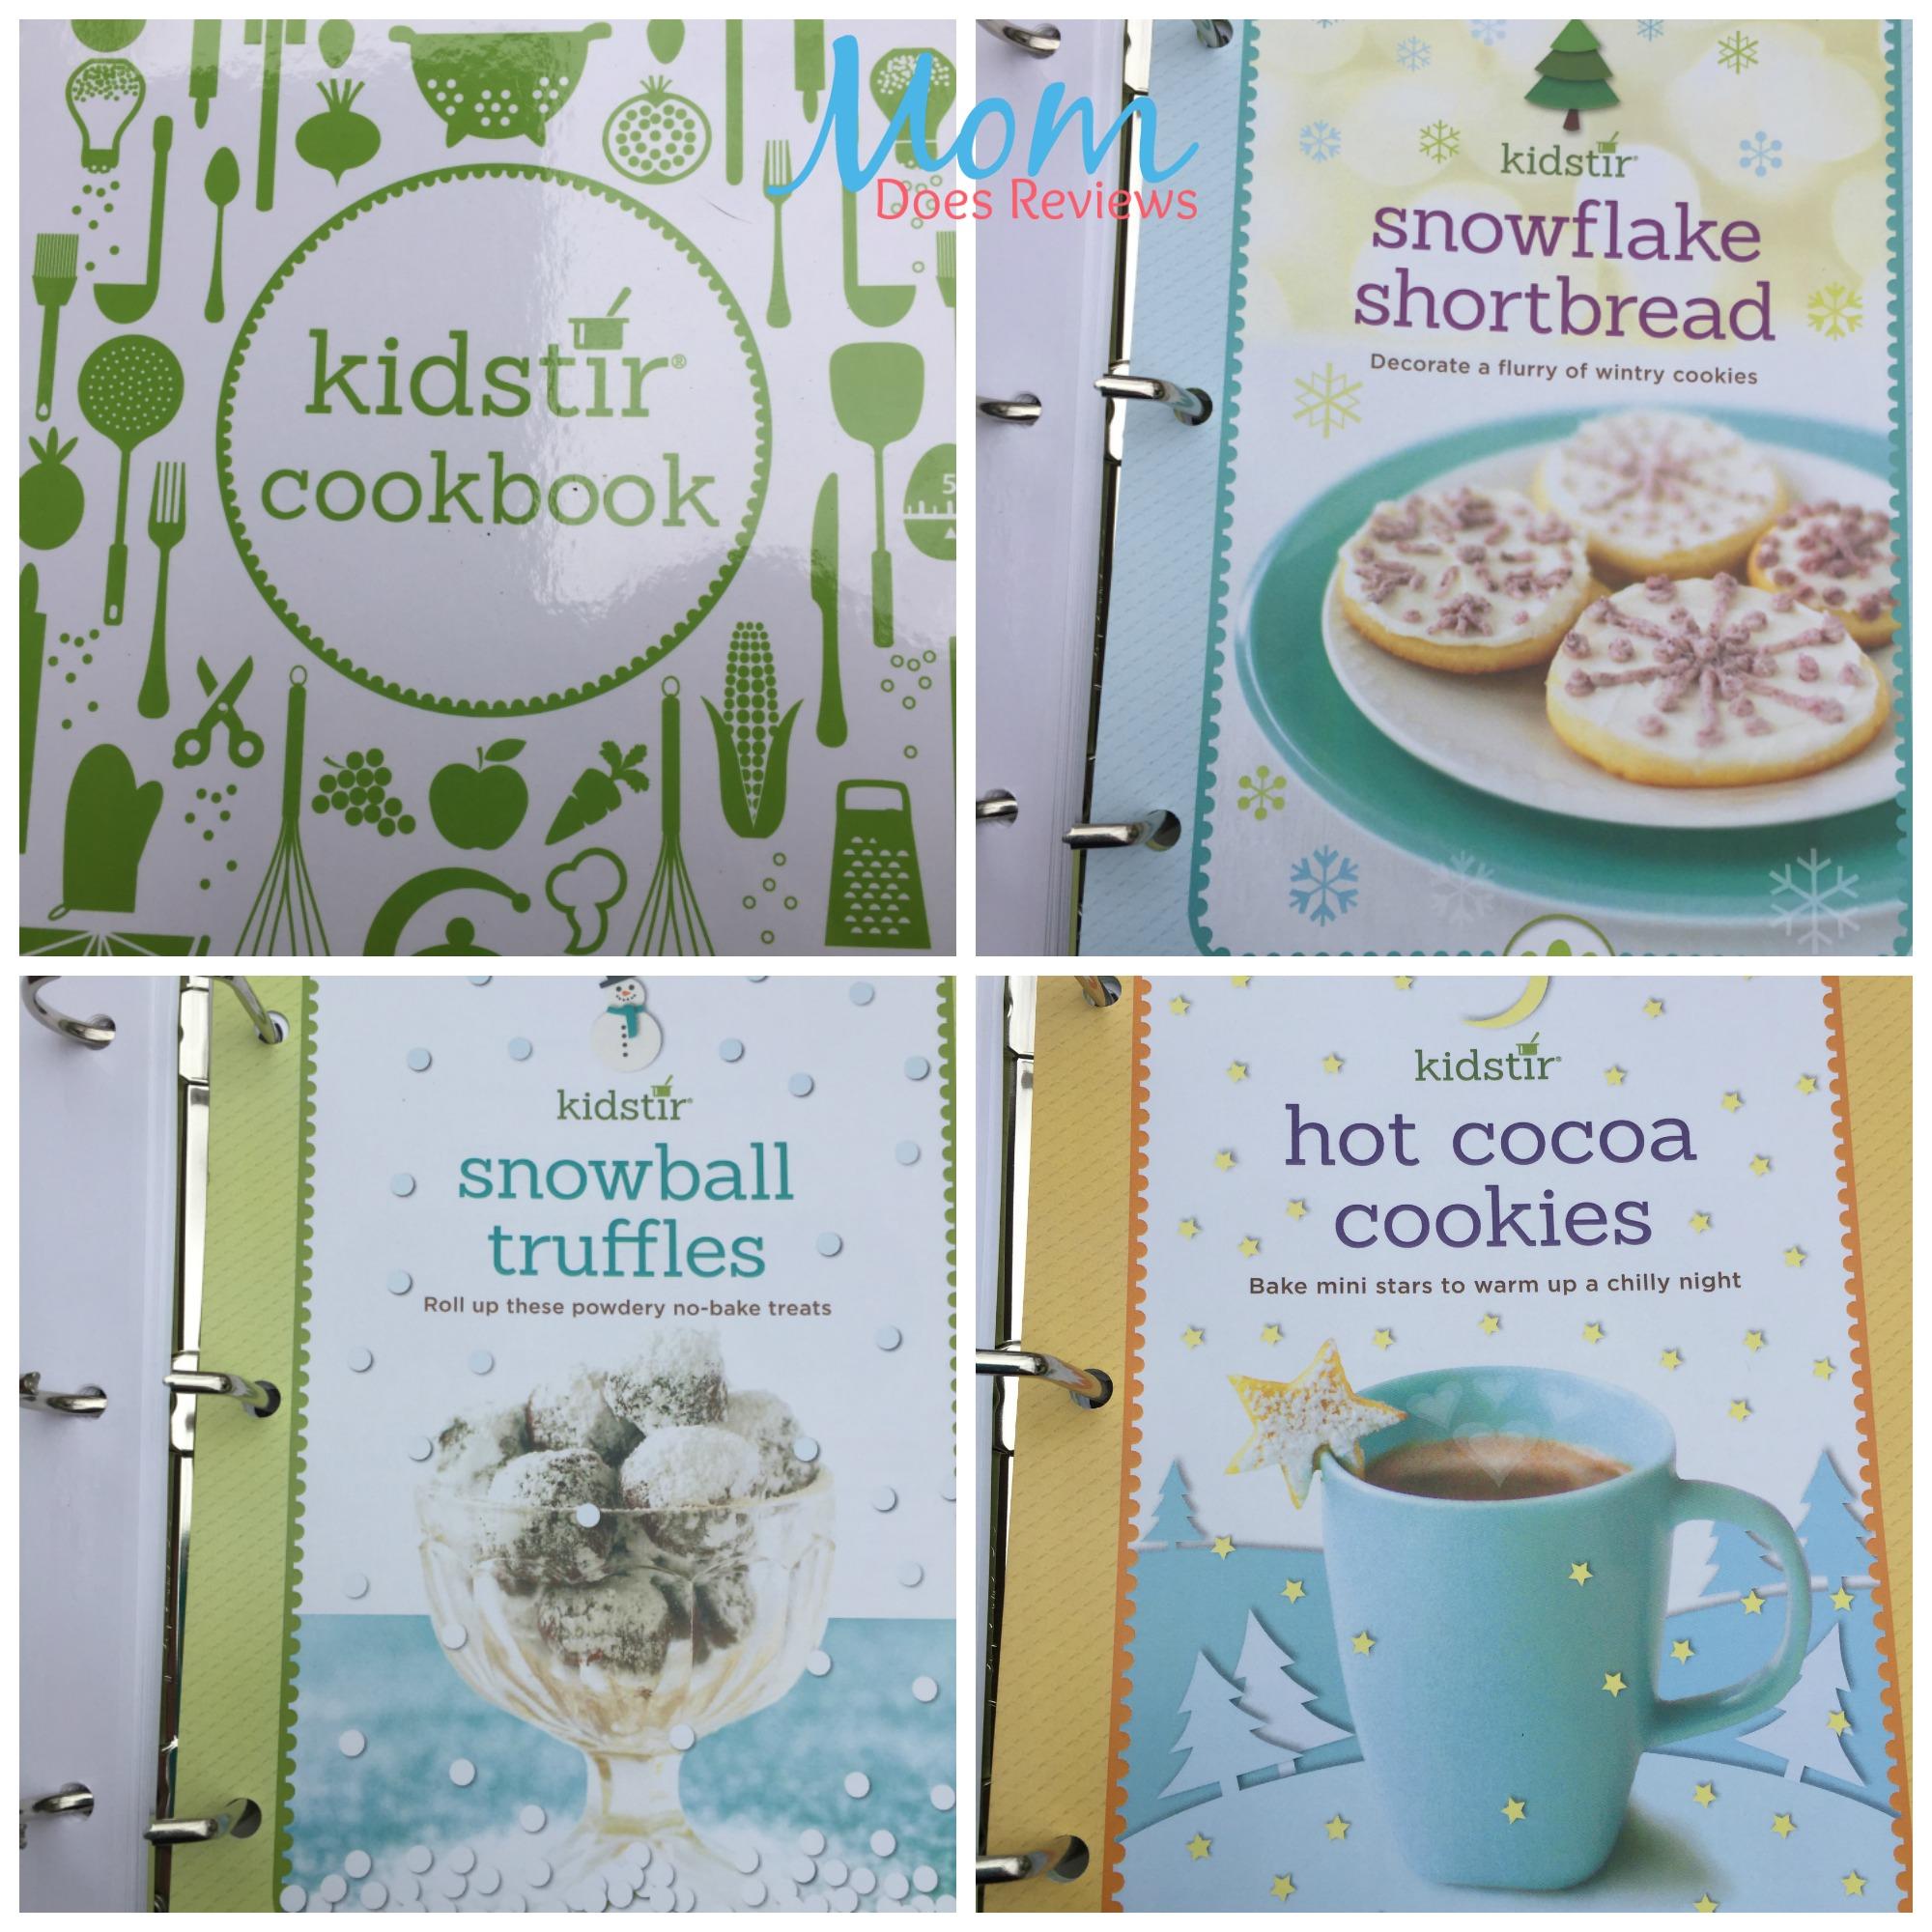 kidstir-cookbook